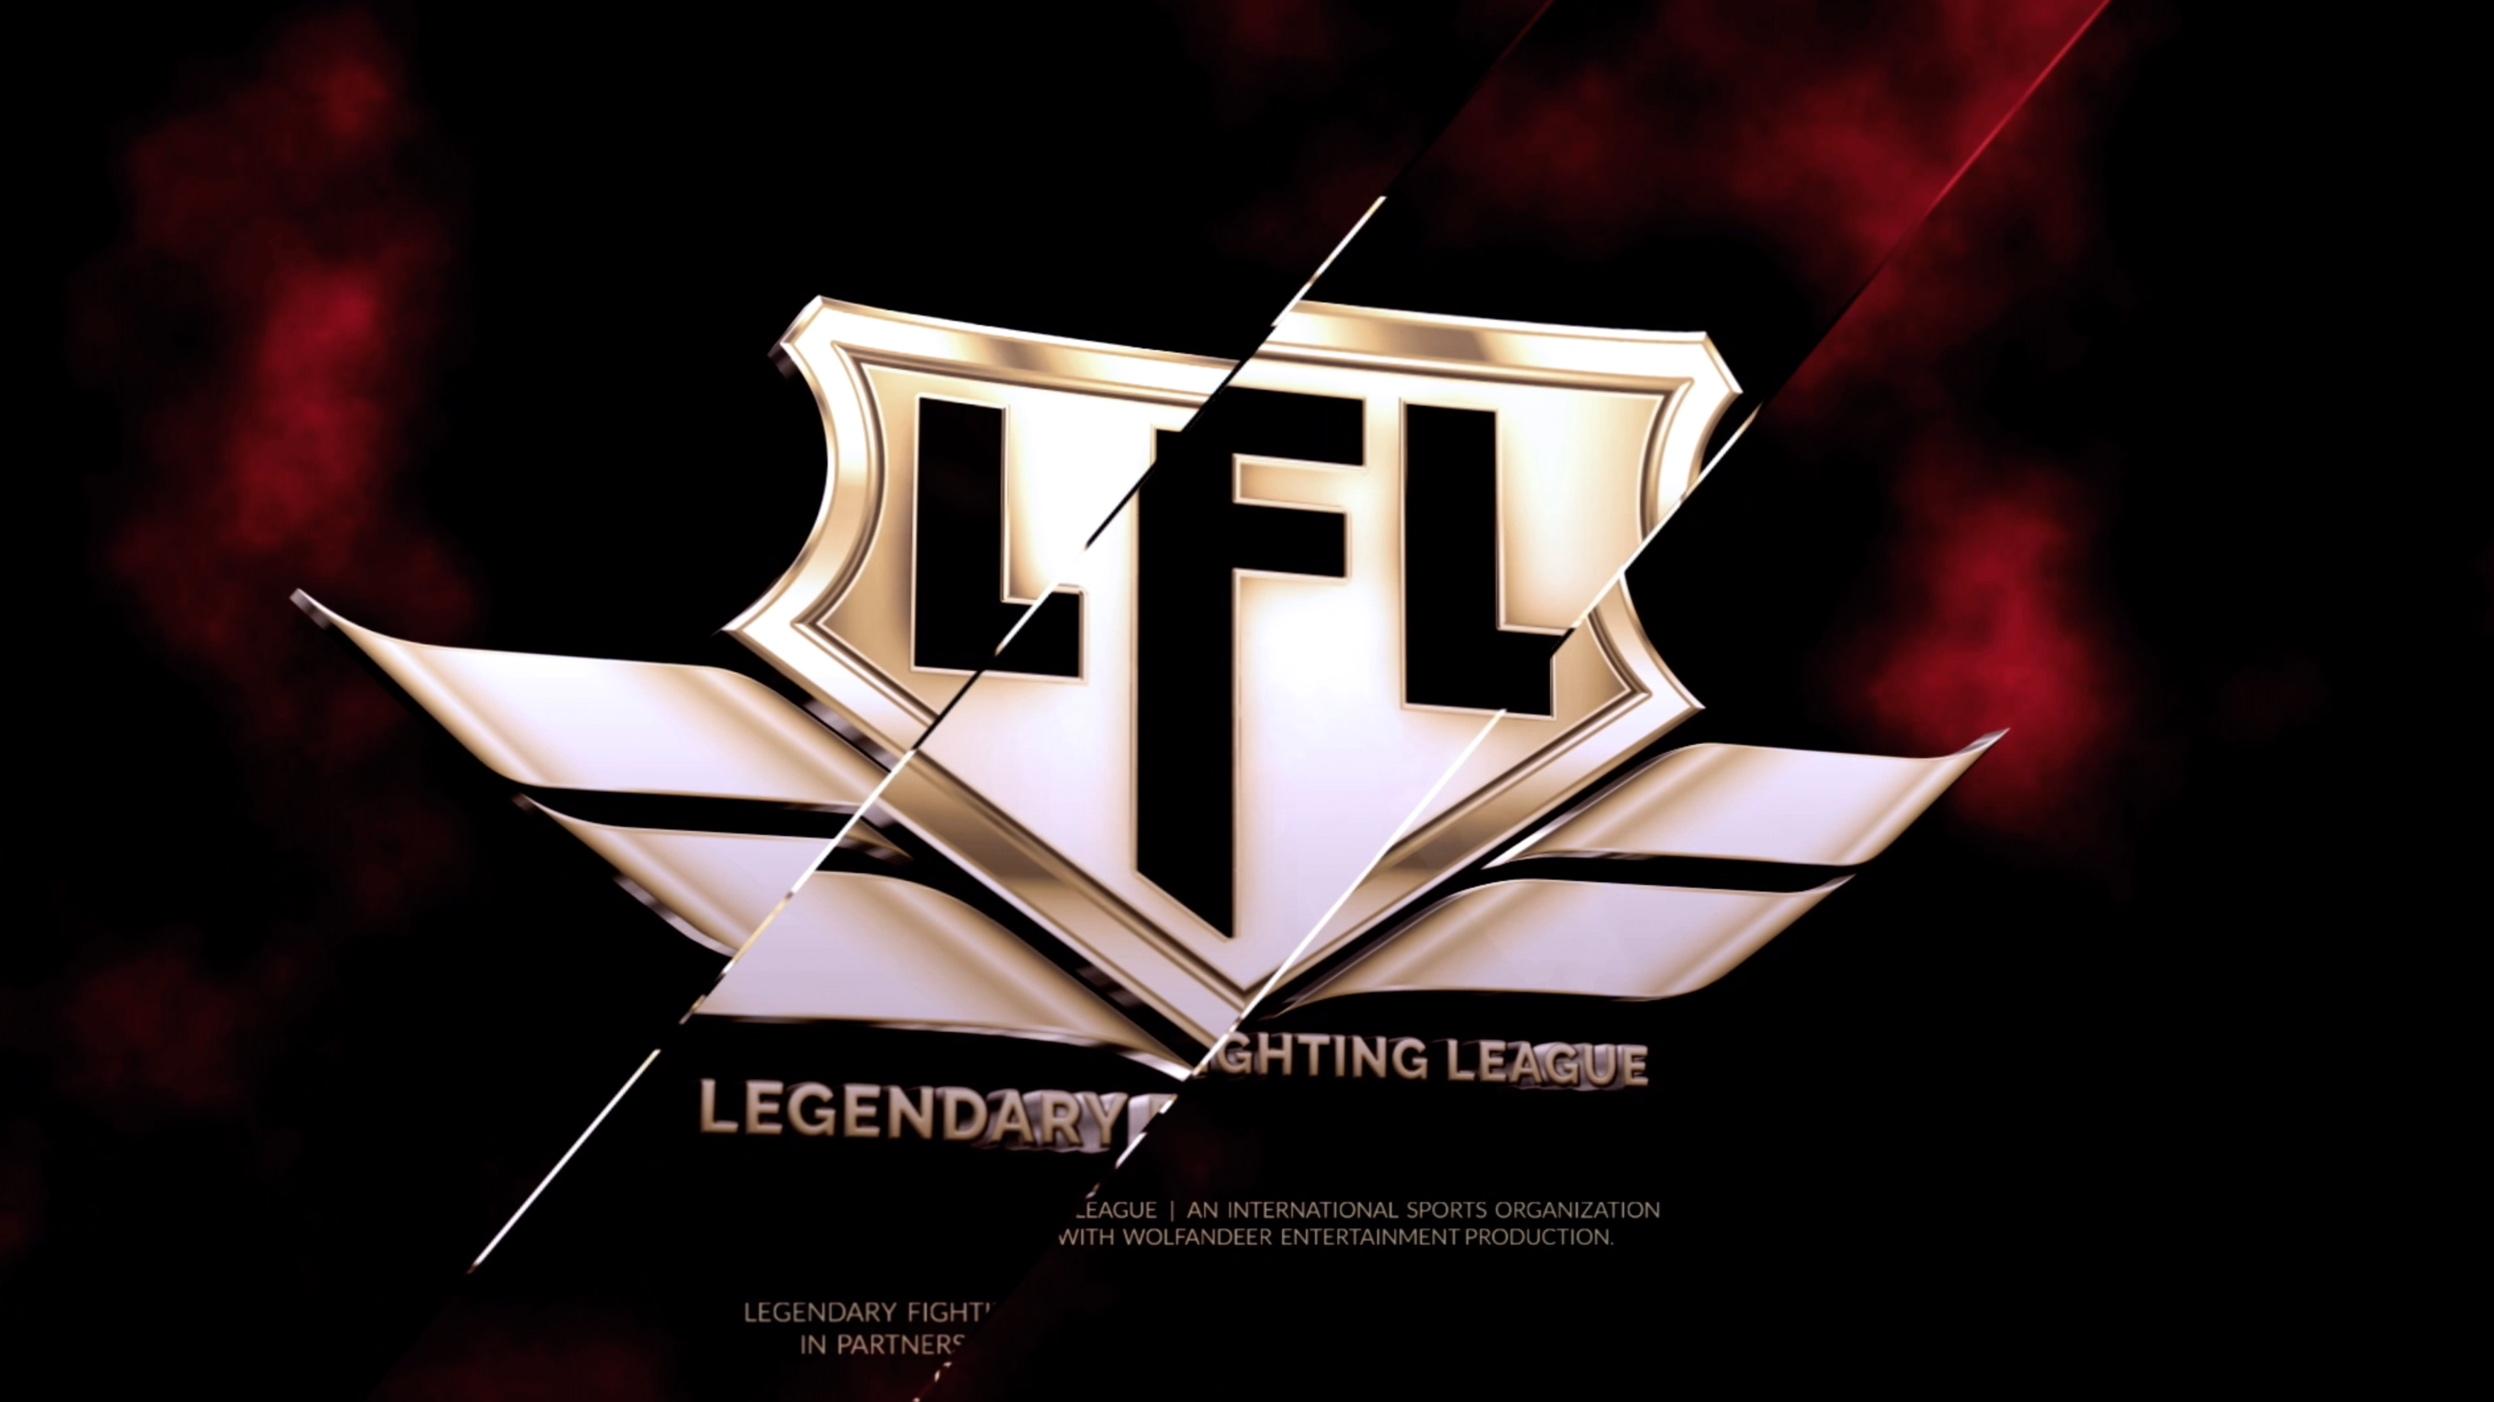 LFL 2 - International Sports Event